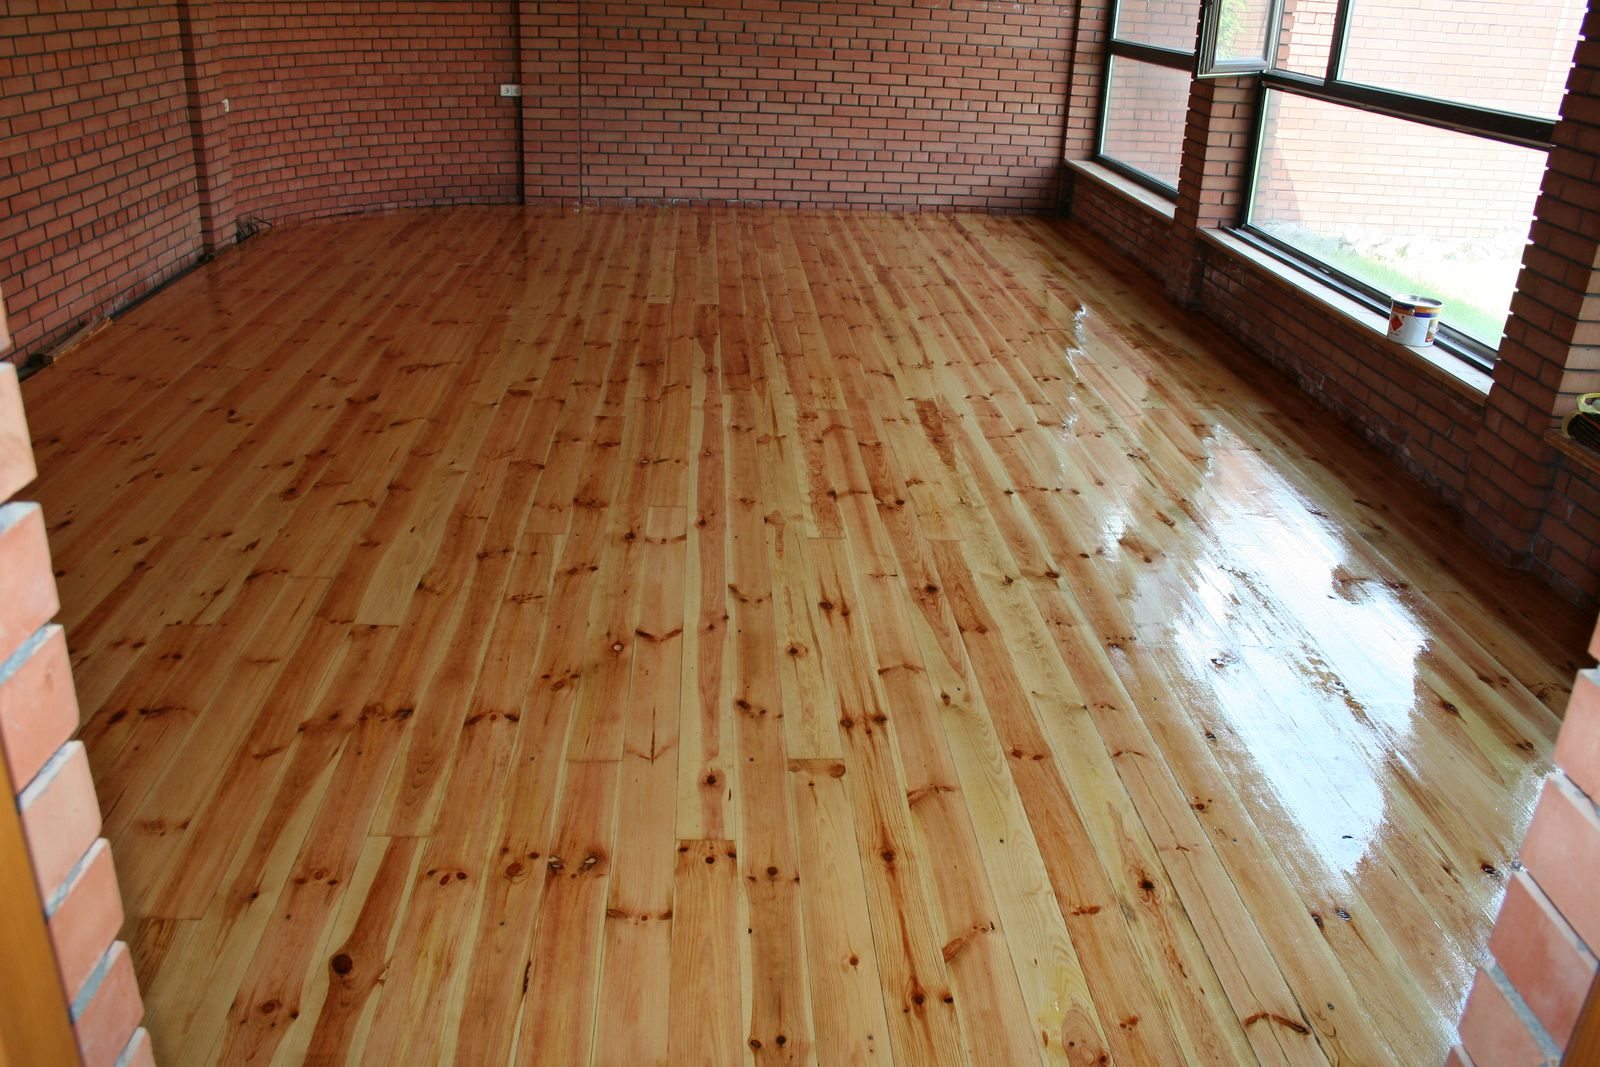 Wooden Floor Painting Or Varnishing